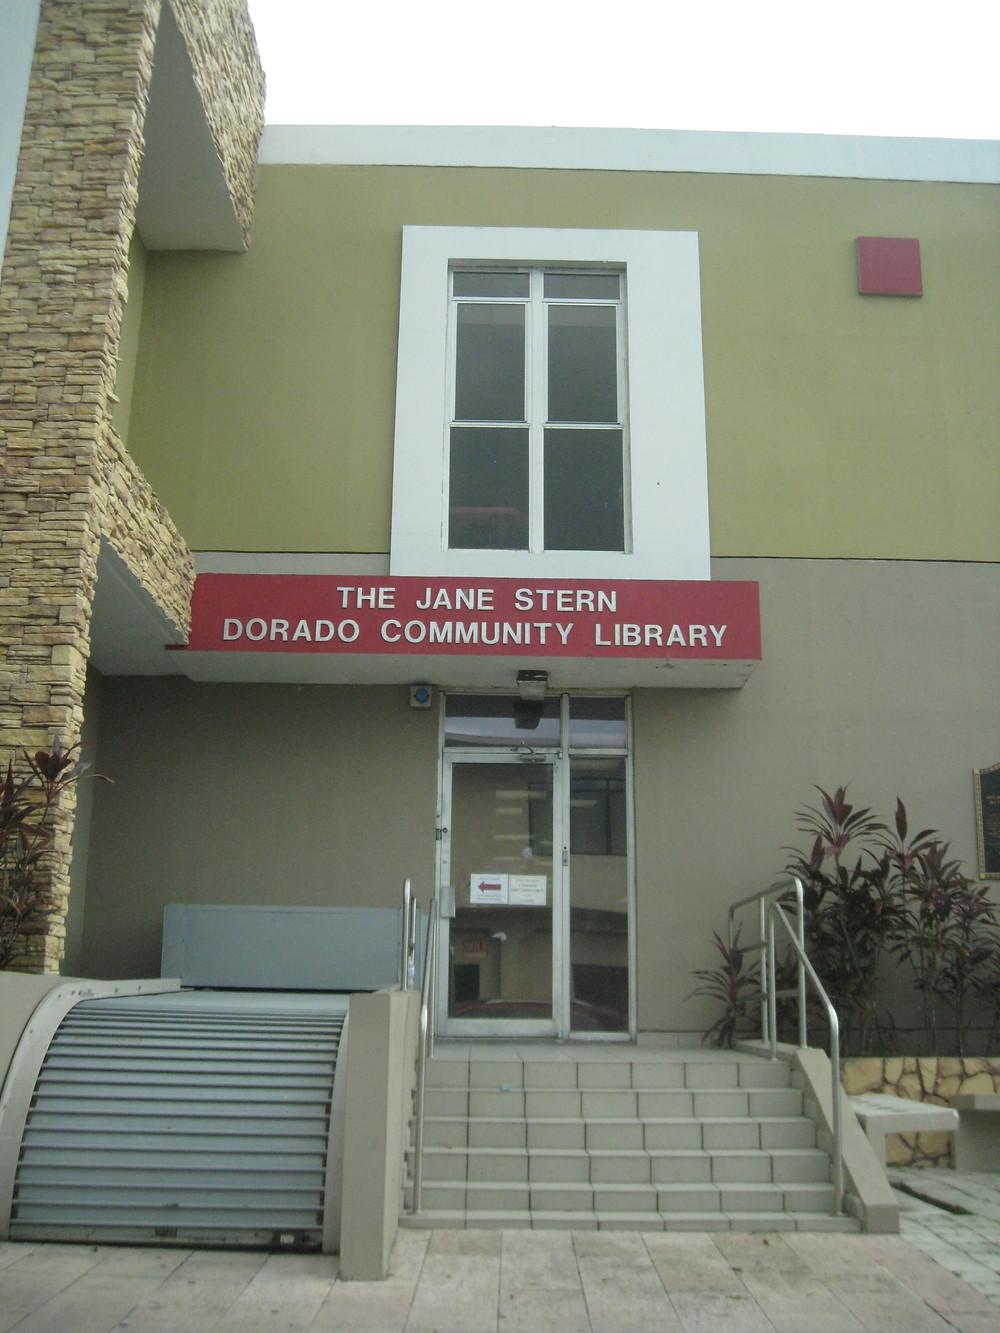 Jane Stern Community Library at Dorado, PR